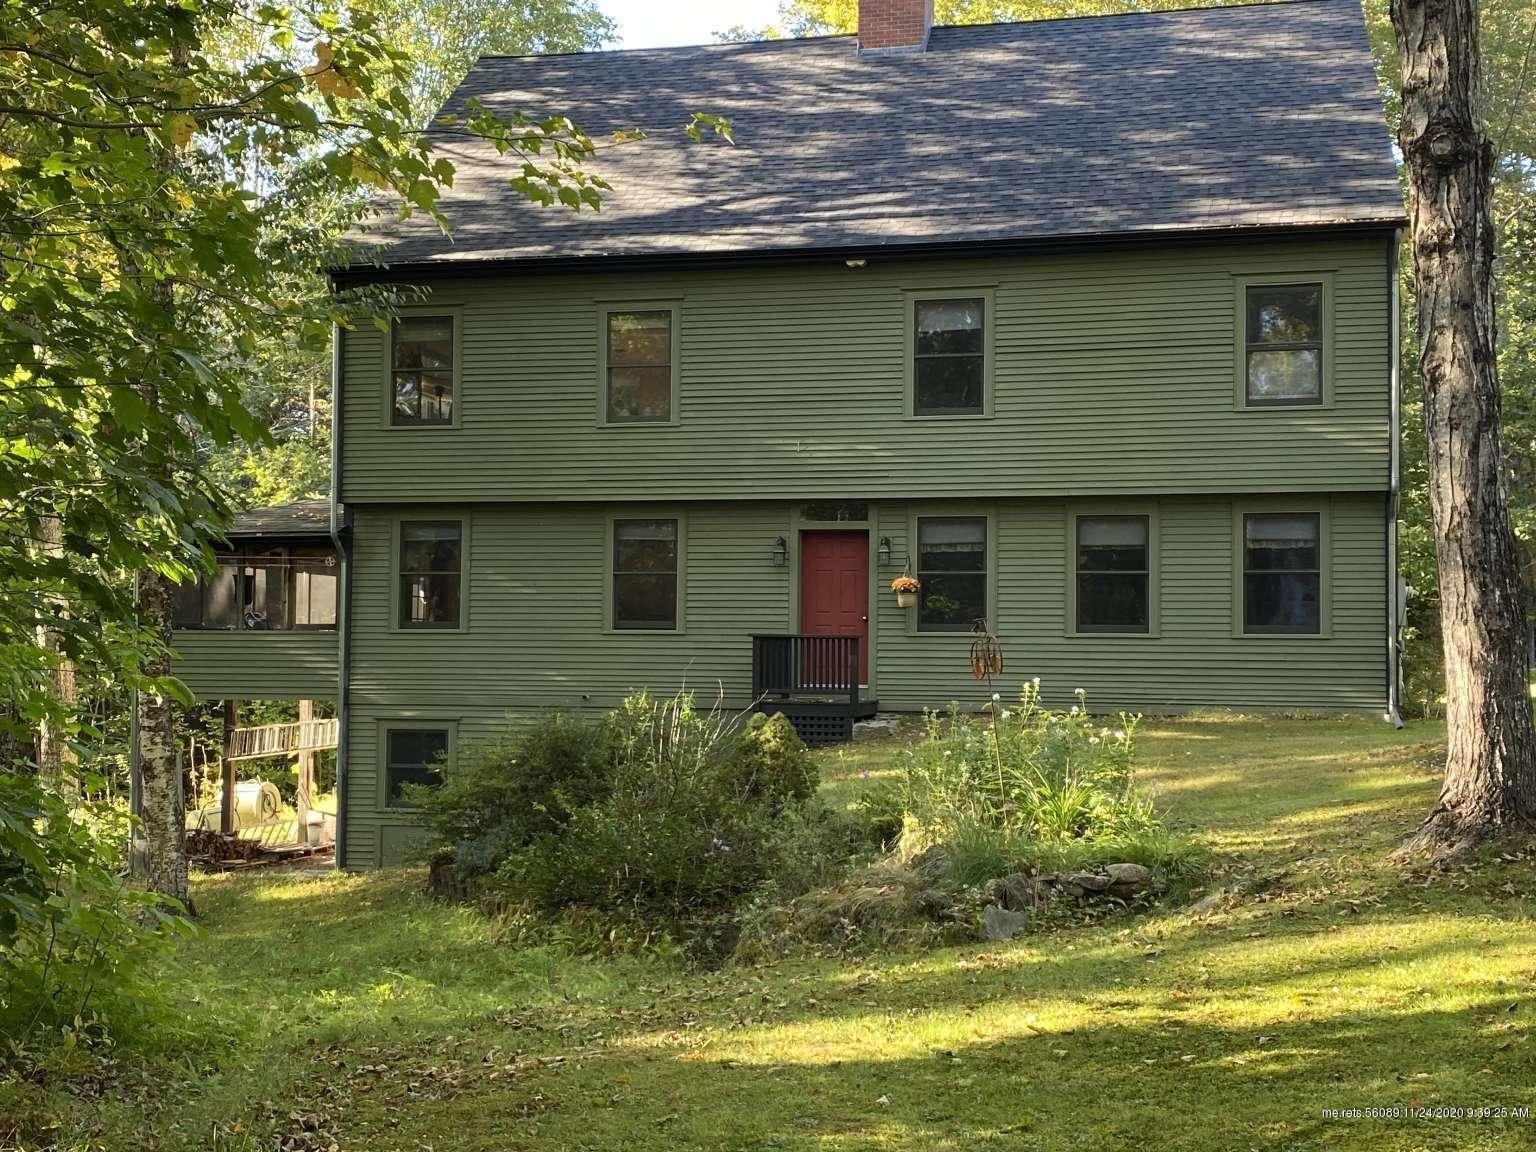 Photo of 846 Pond Road, Nobleboro, ME 04555 (MLS # 1474079)